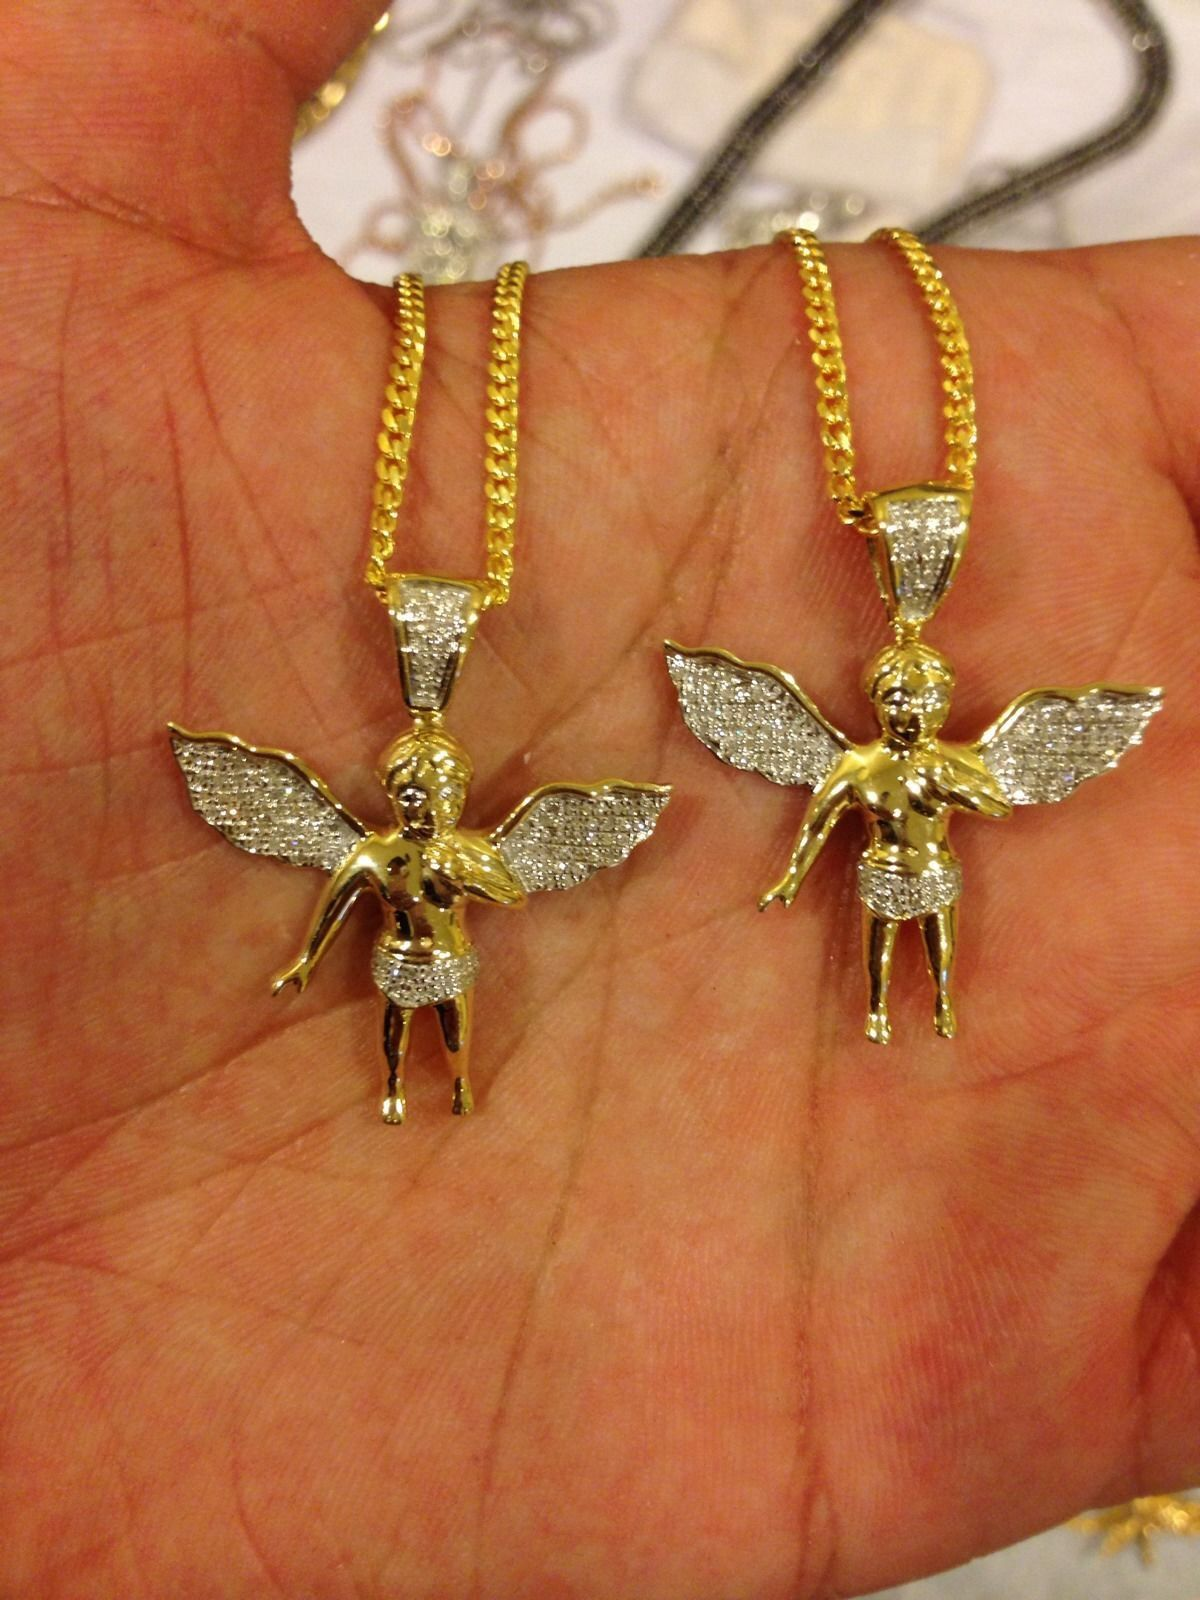 10k Gold Cuban Link Chain >> 2x Micro Angel 10k Gold Pendant Set w/ Free Chains ...